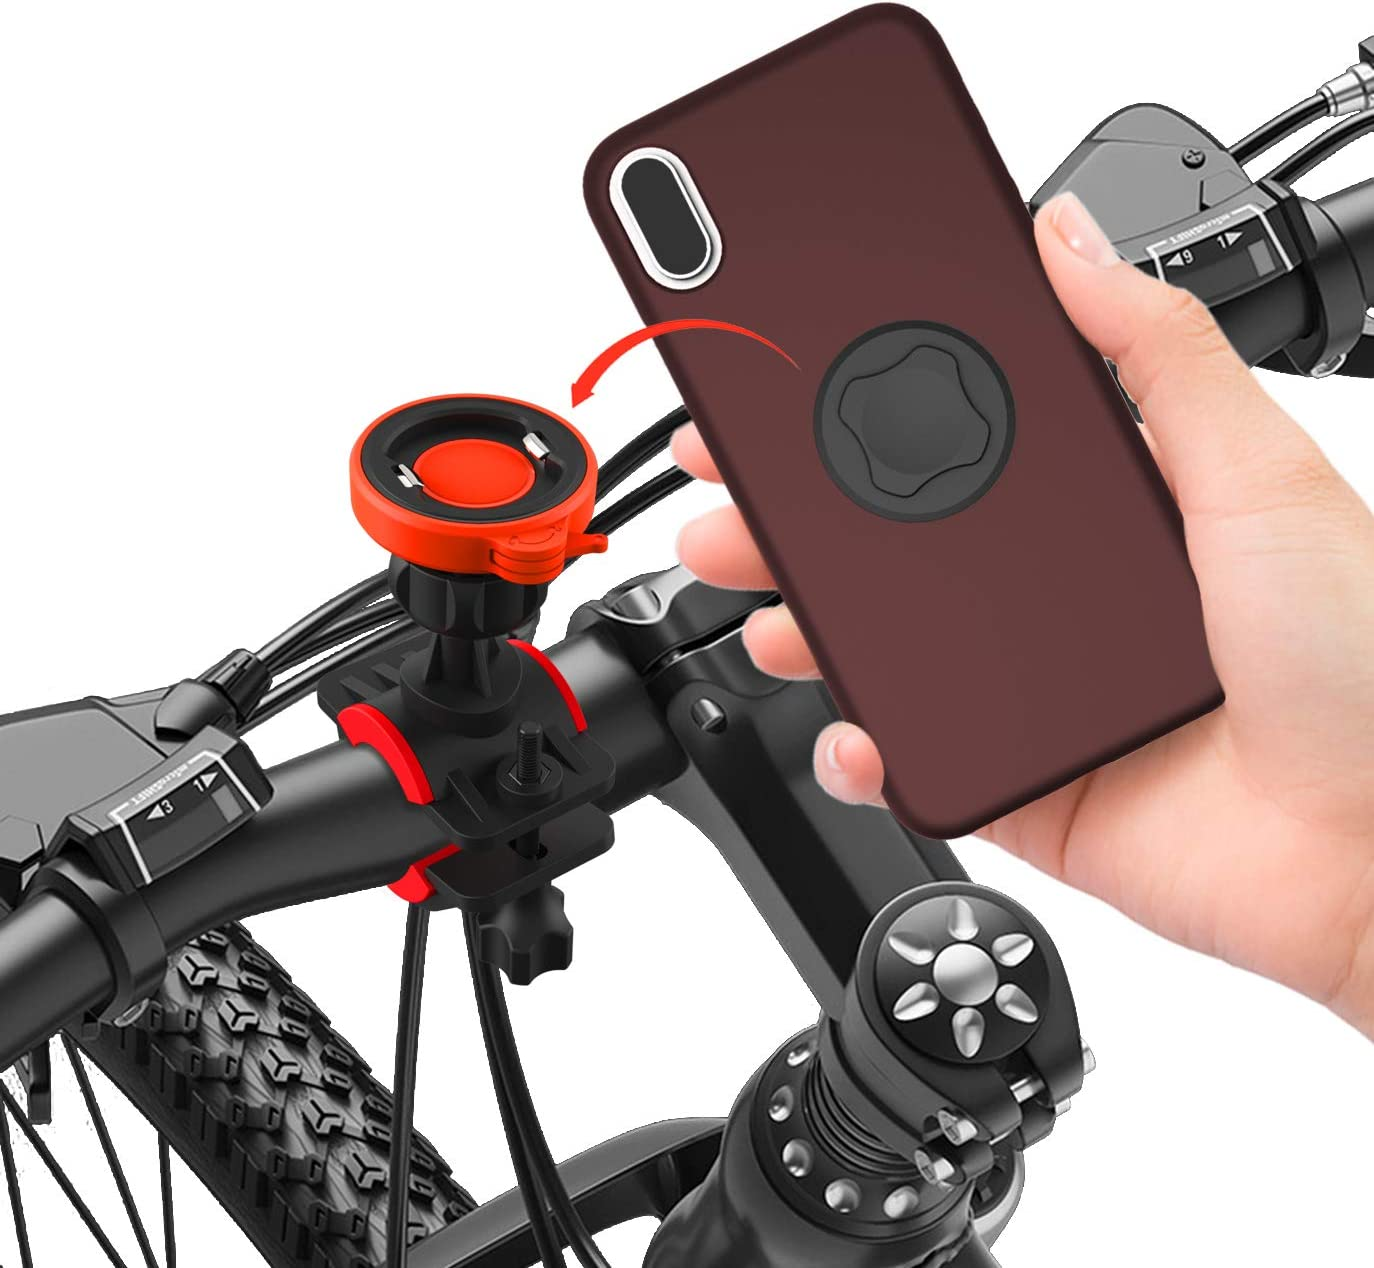 MTB Road Bike Computer Adapter Mount Phone Holder Bicycle Electronics Bracket